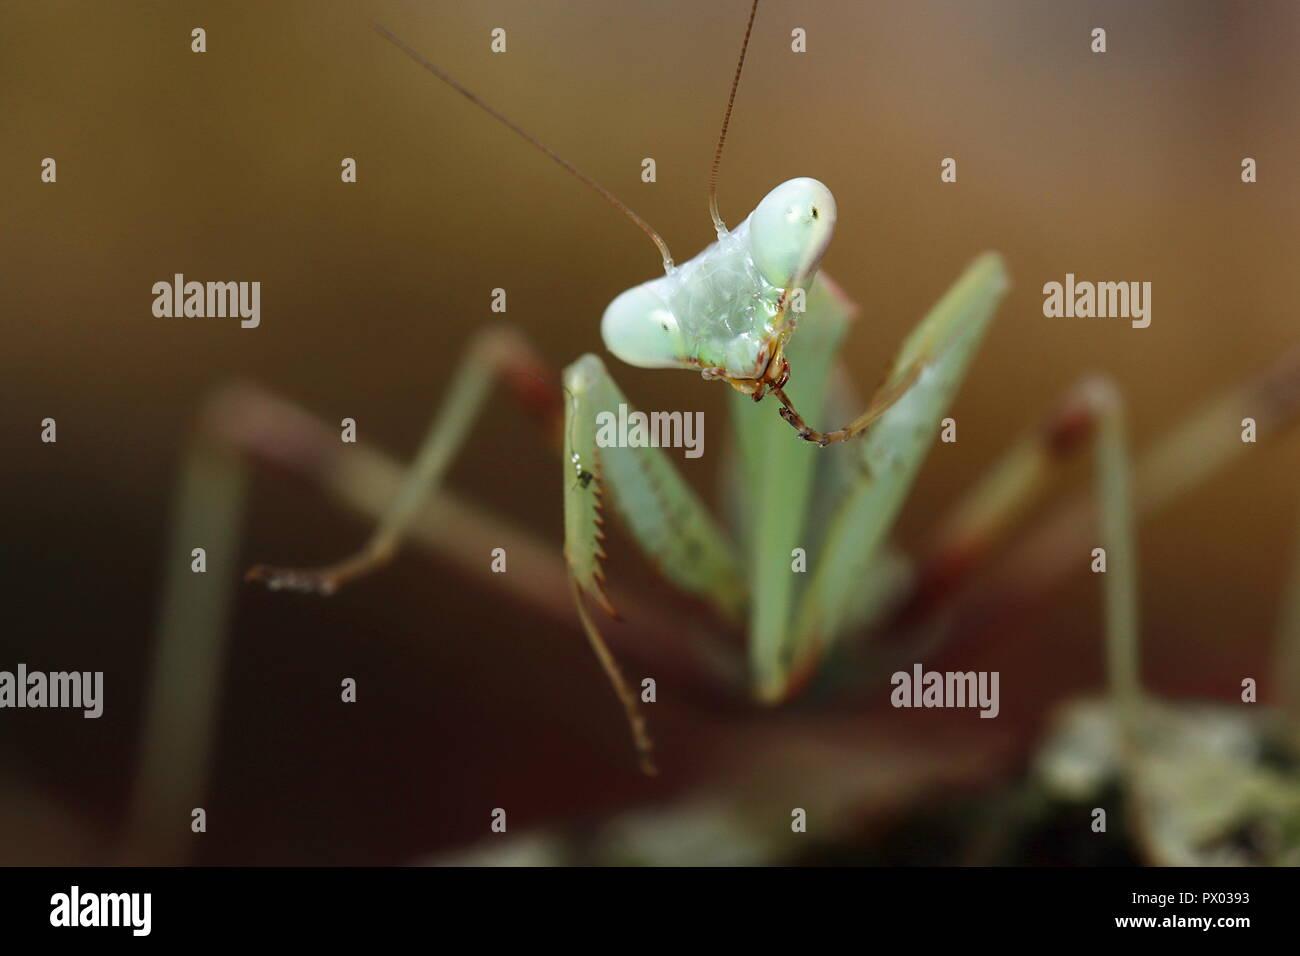 Praying mantis Giant Asian Mantis Hierodula membranacea macro close up - Stock Image